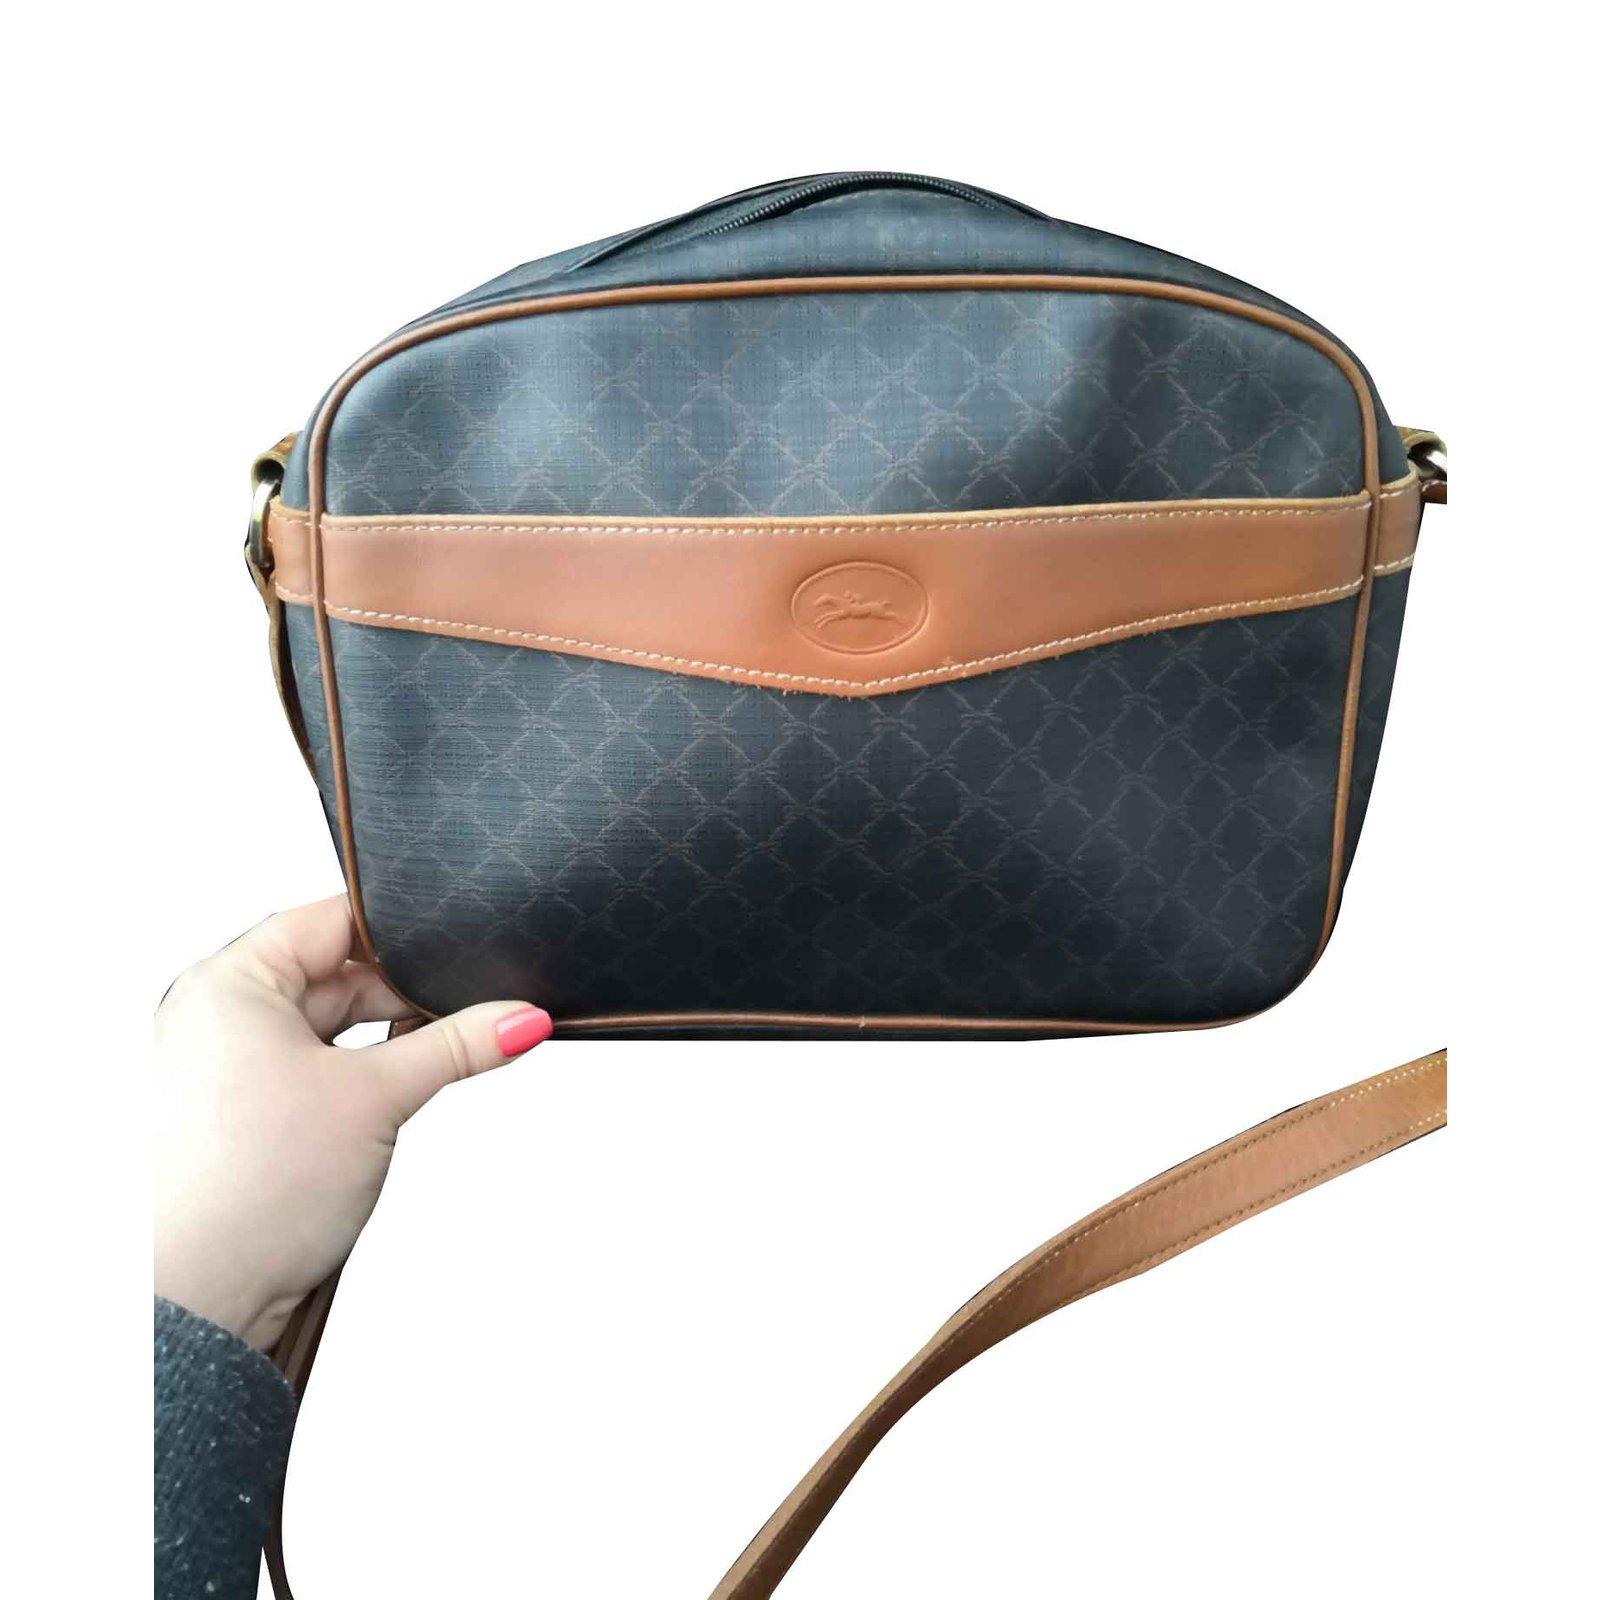 tela pelle in Borse Longchamp vintage nera abbastanza Borsa xqtqY7EwR